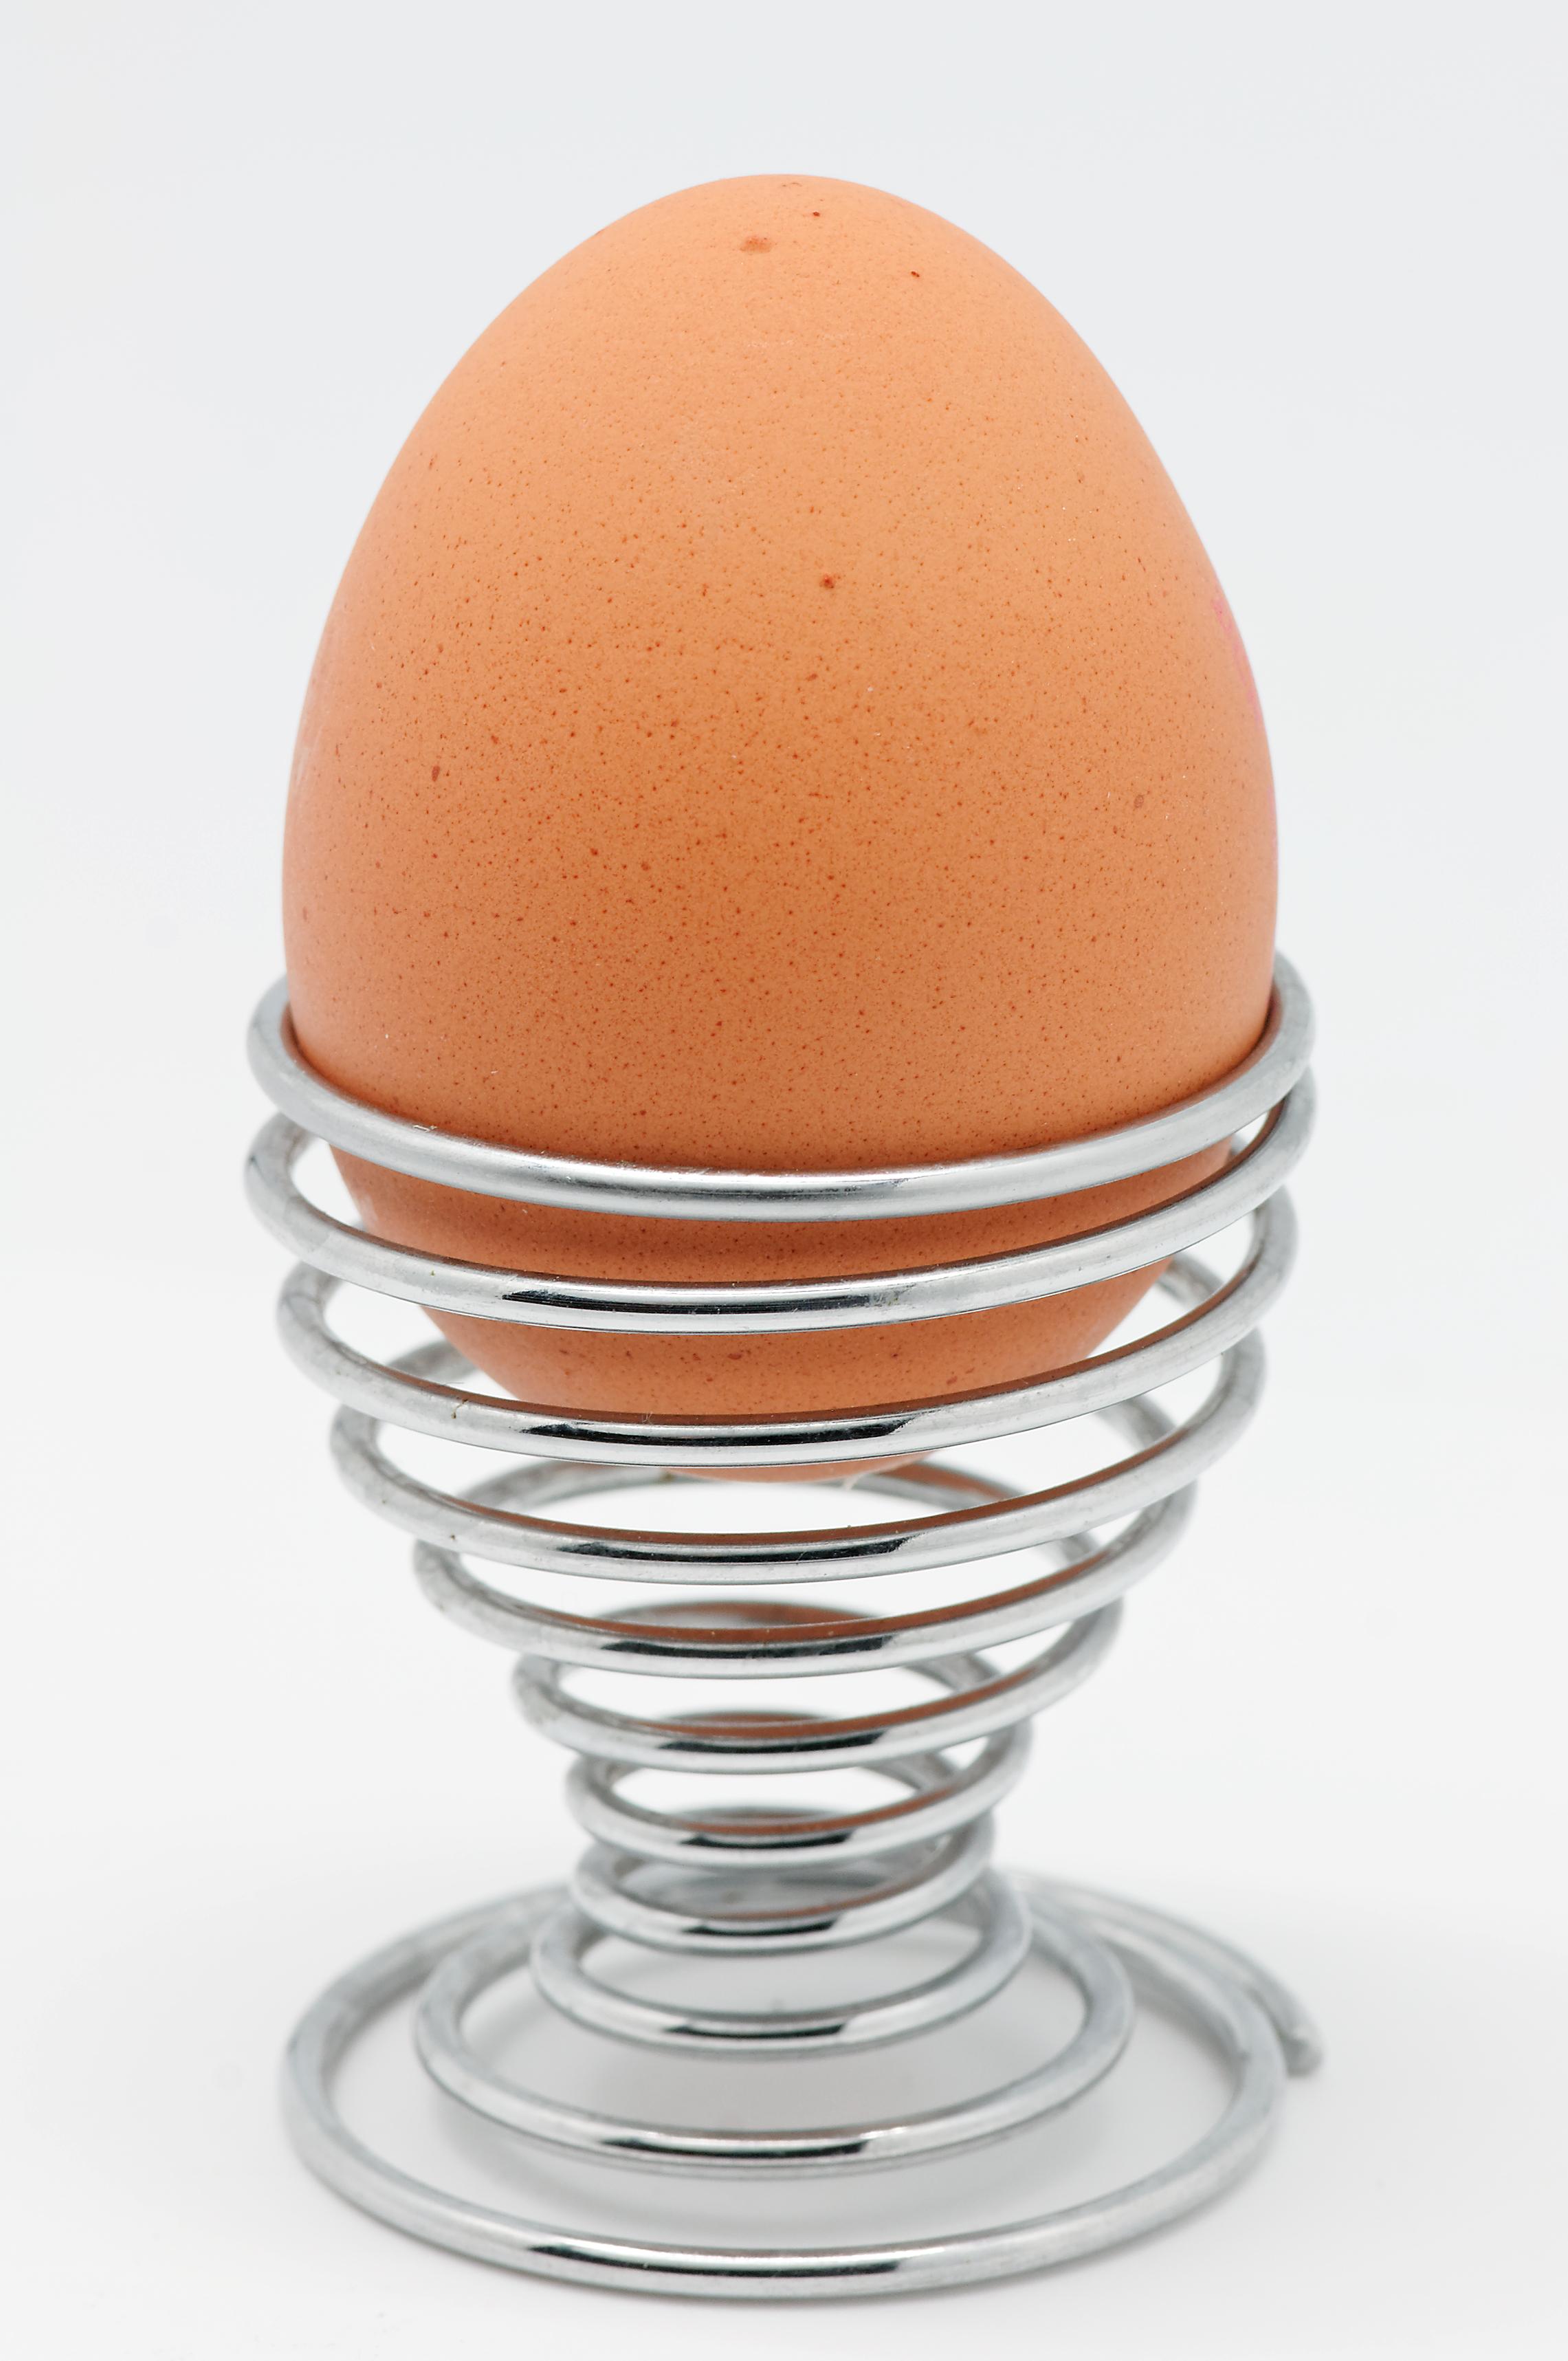 boiled egg wikipedia